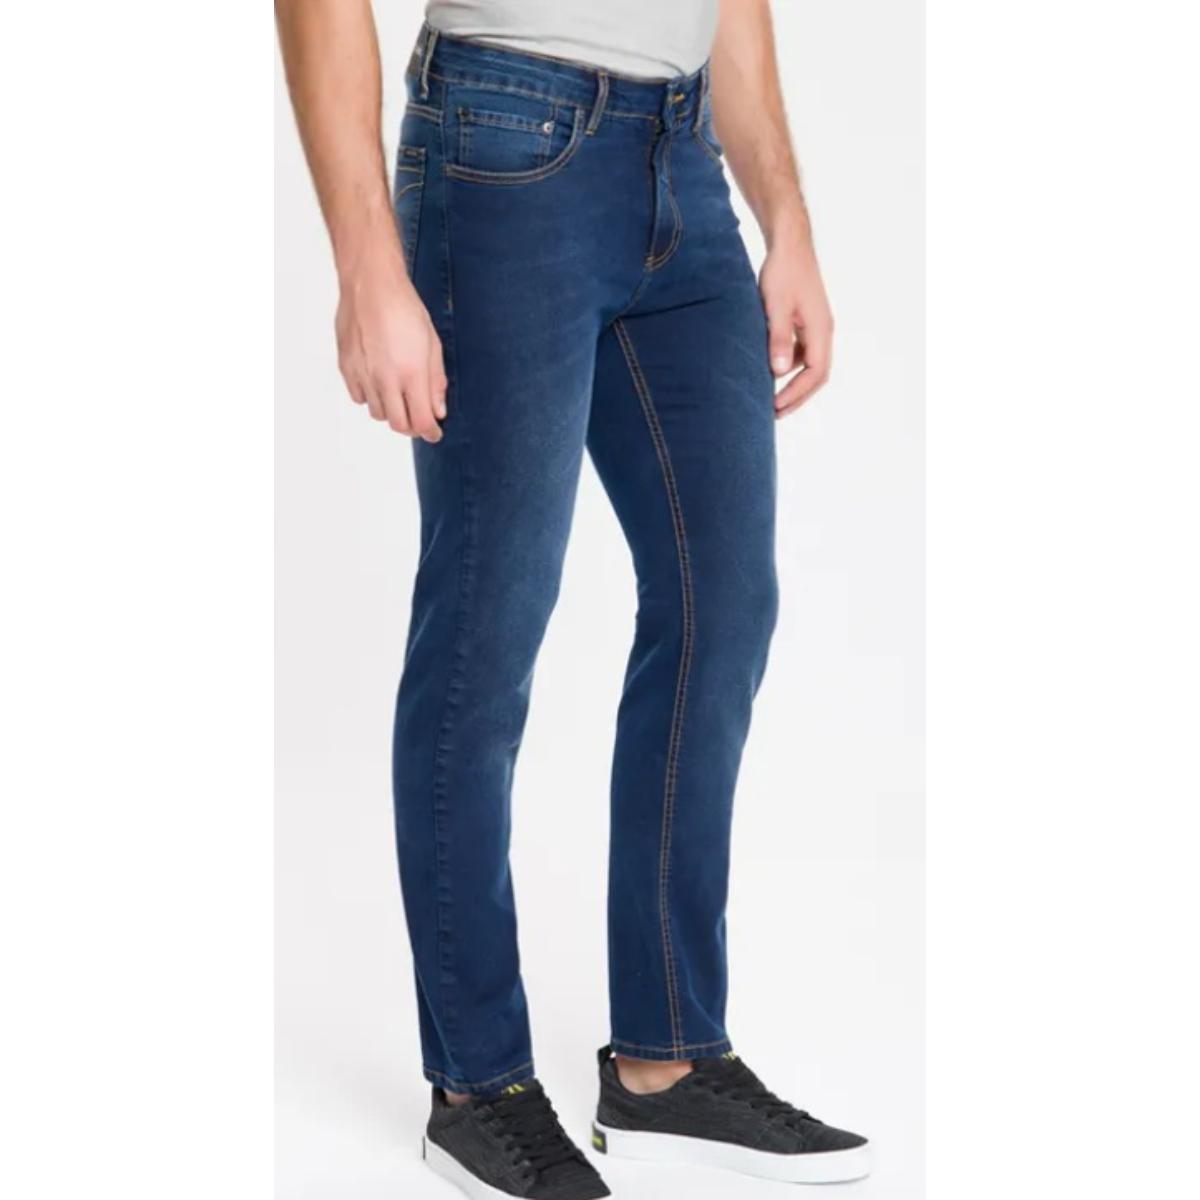 Calça Masculina Calvin Klein Cm0oc11ds331 Marinho